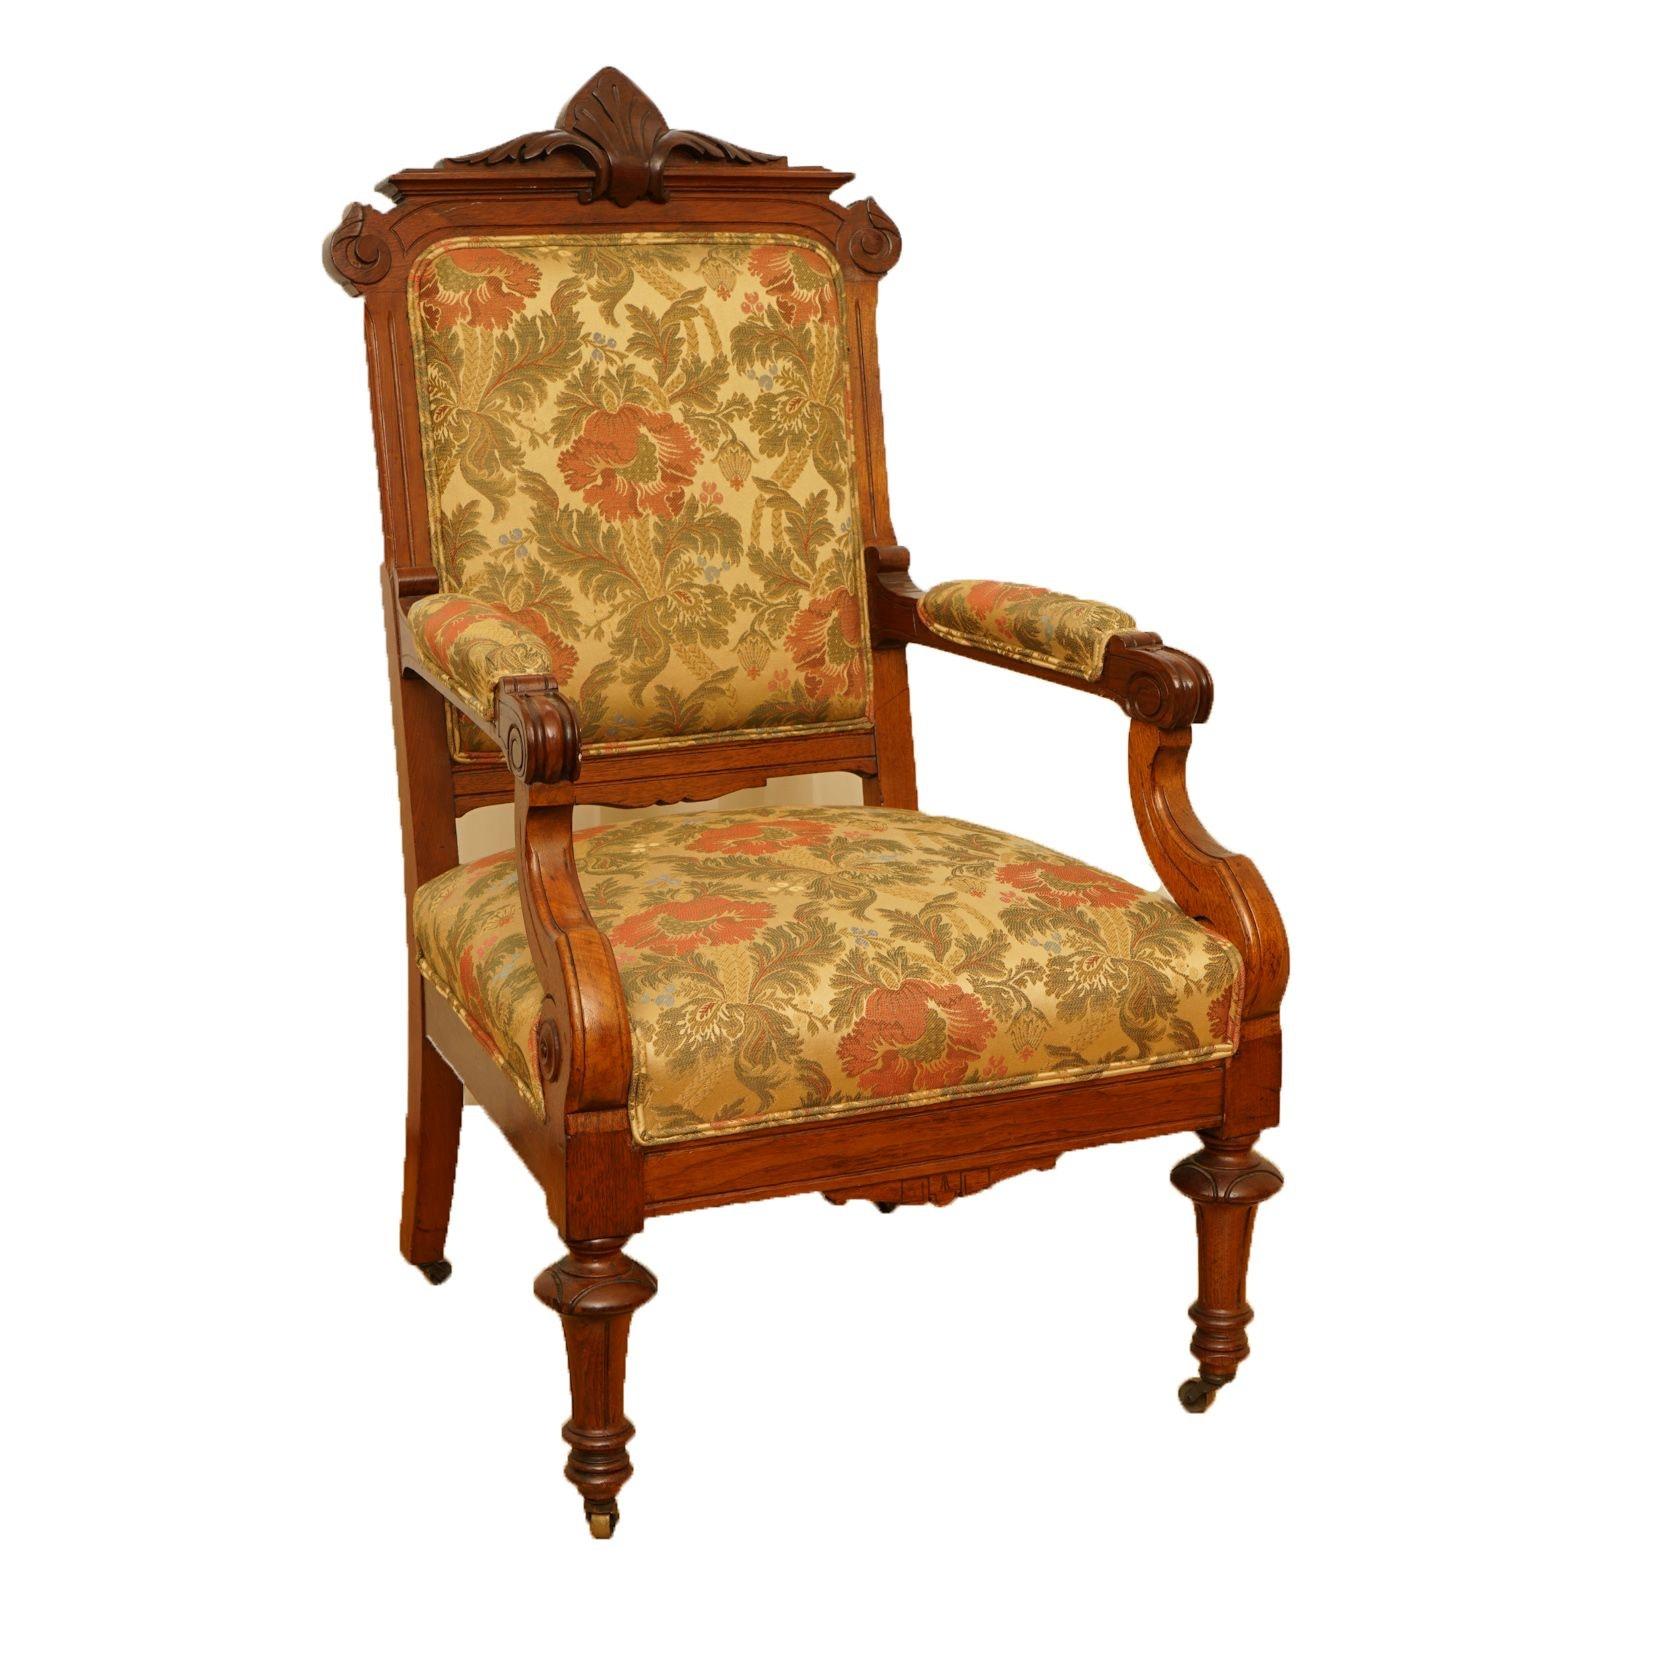 Vintage Eastlake Style Upholstered Armchair